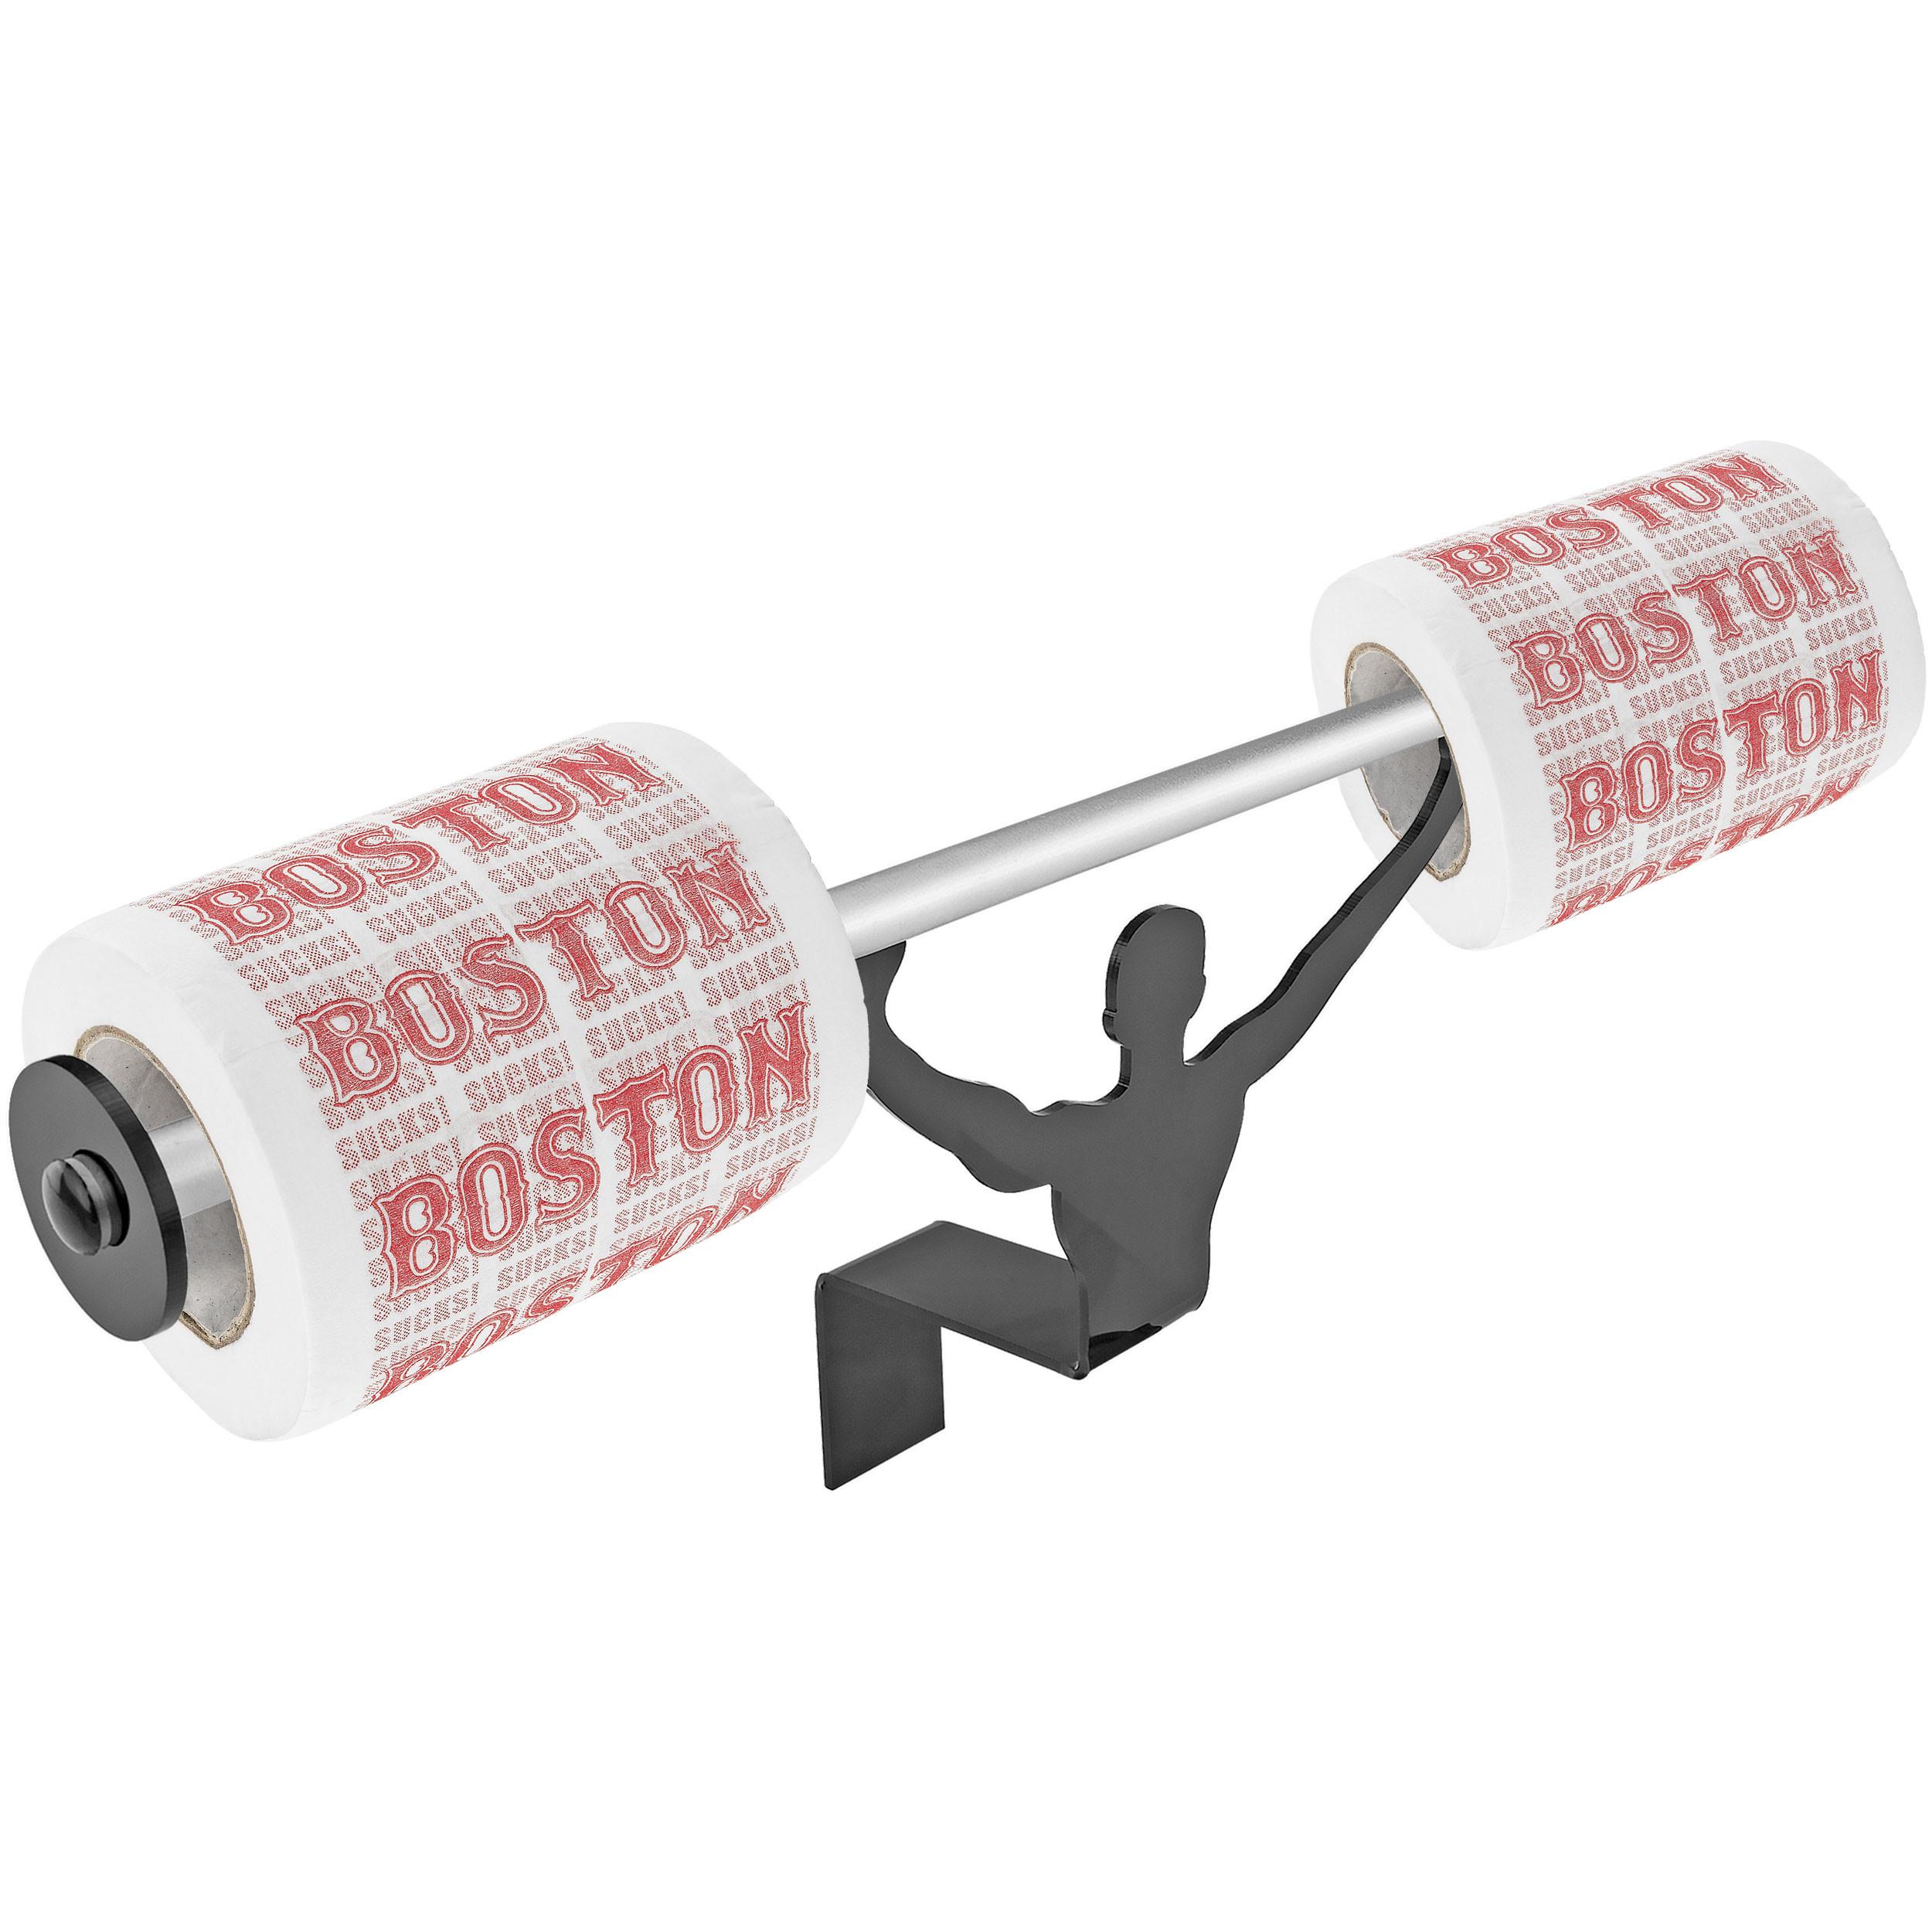 Fairly Odd Novelties FON-10159 Boston Sucks Toilet Paper W/Strong Man Holder Gift Set